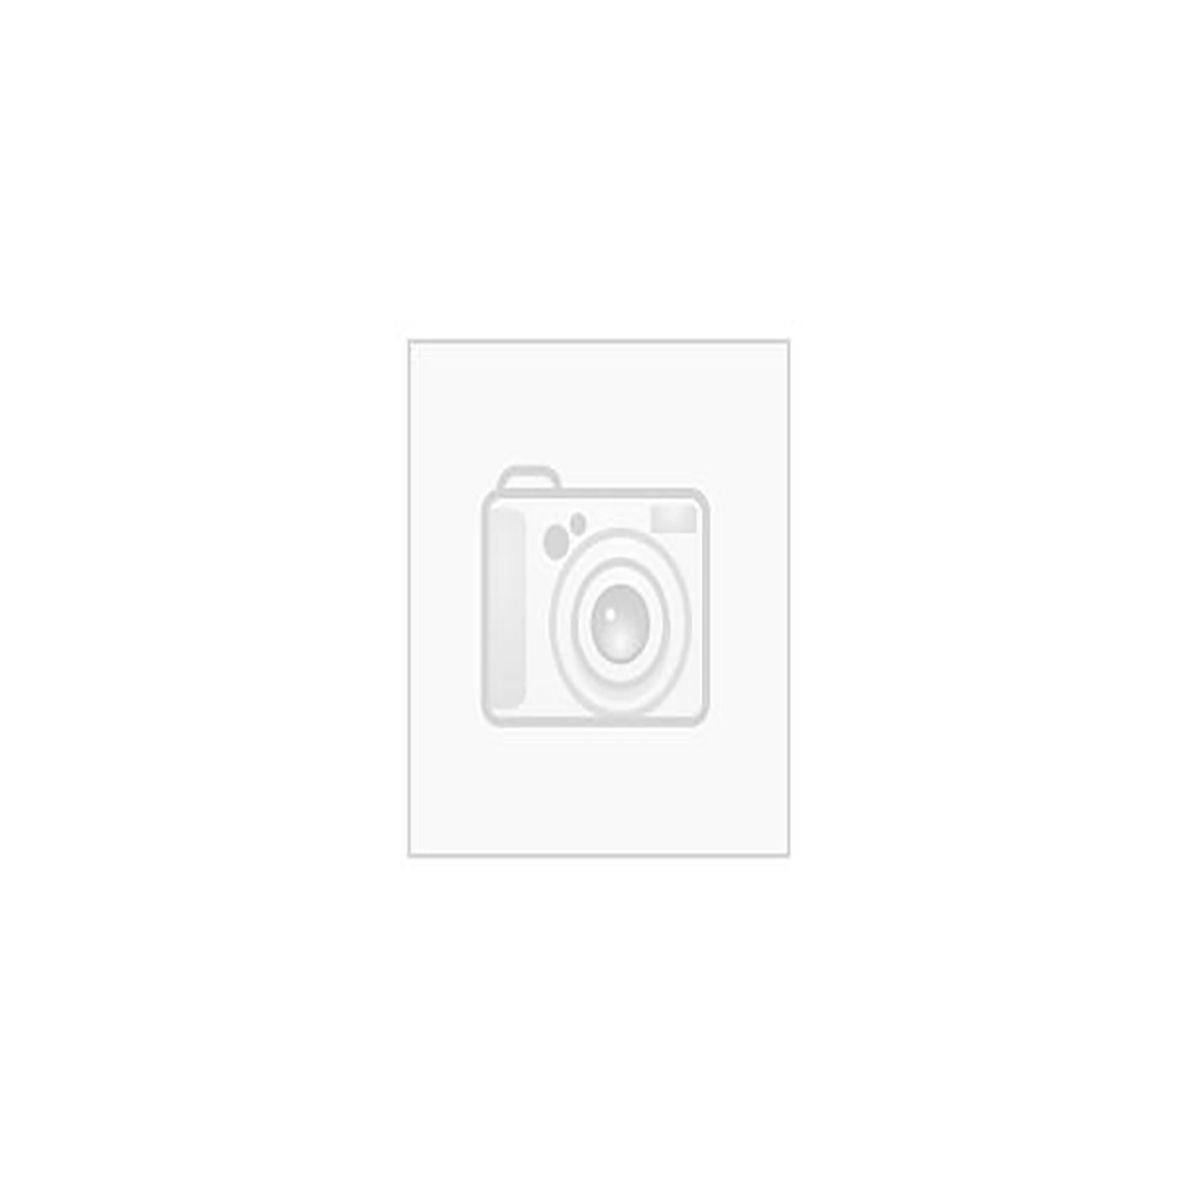 Tapwell - Classic  XCOL 000 – Dusj